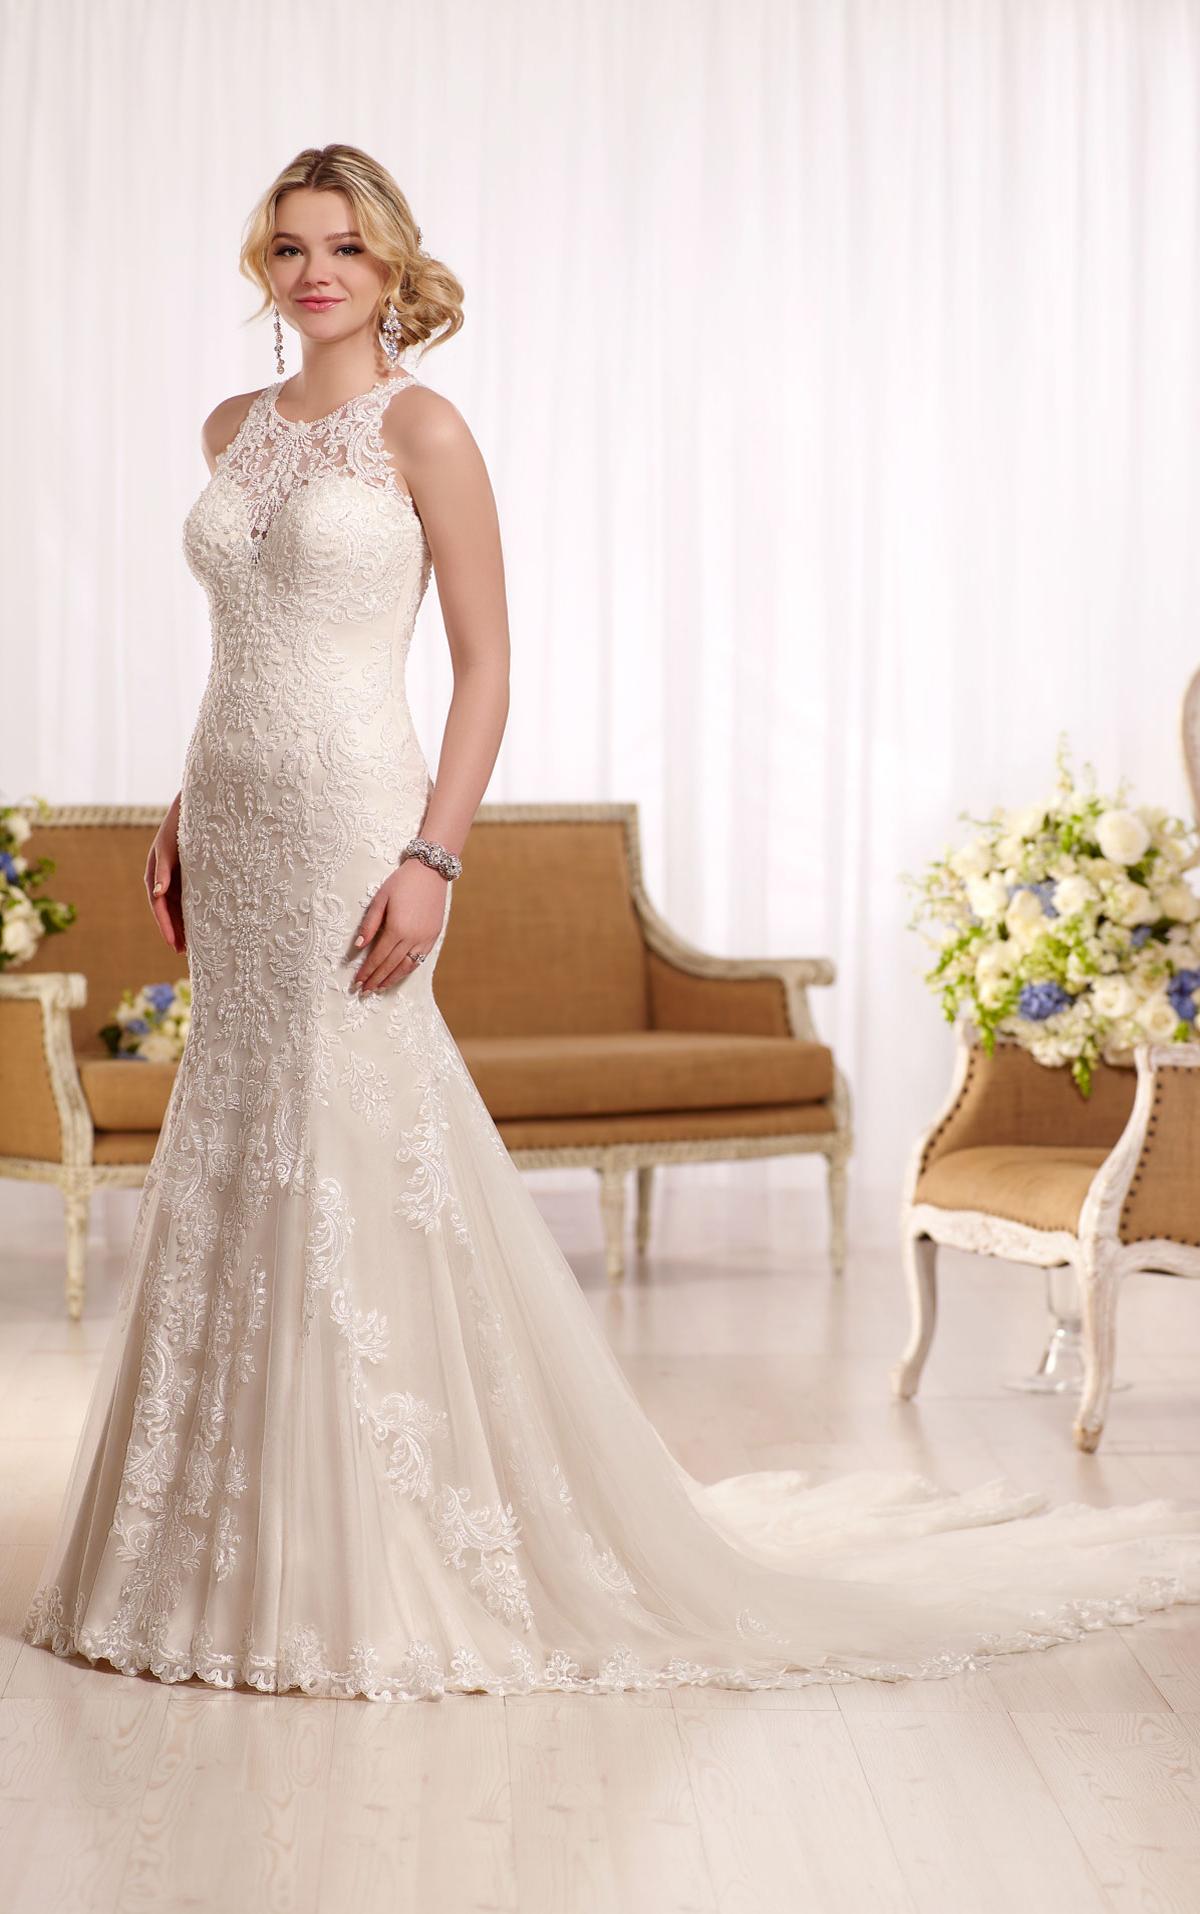 Wedding Dress With Lace Up Back 90 Popular essense